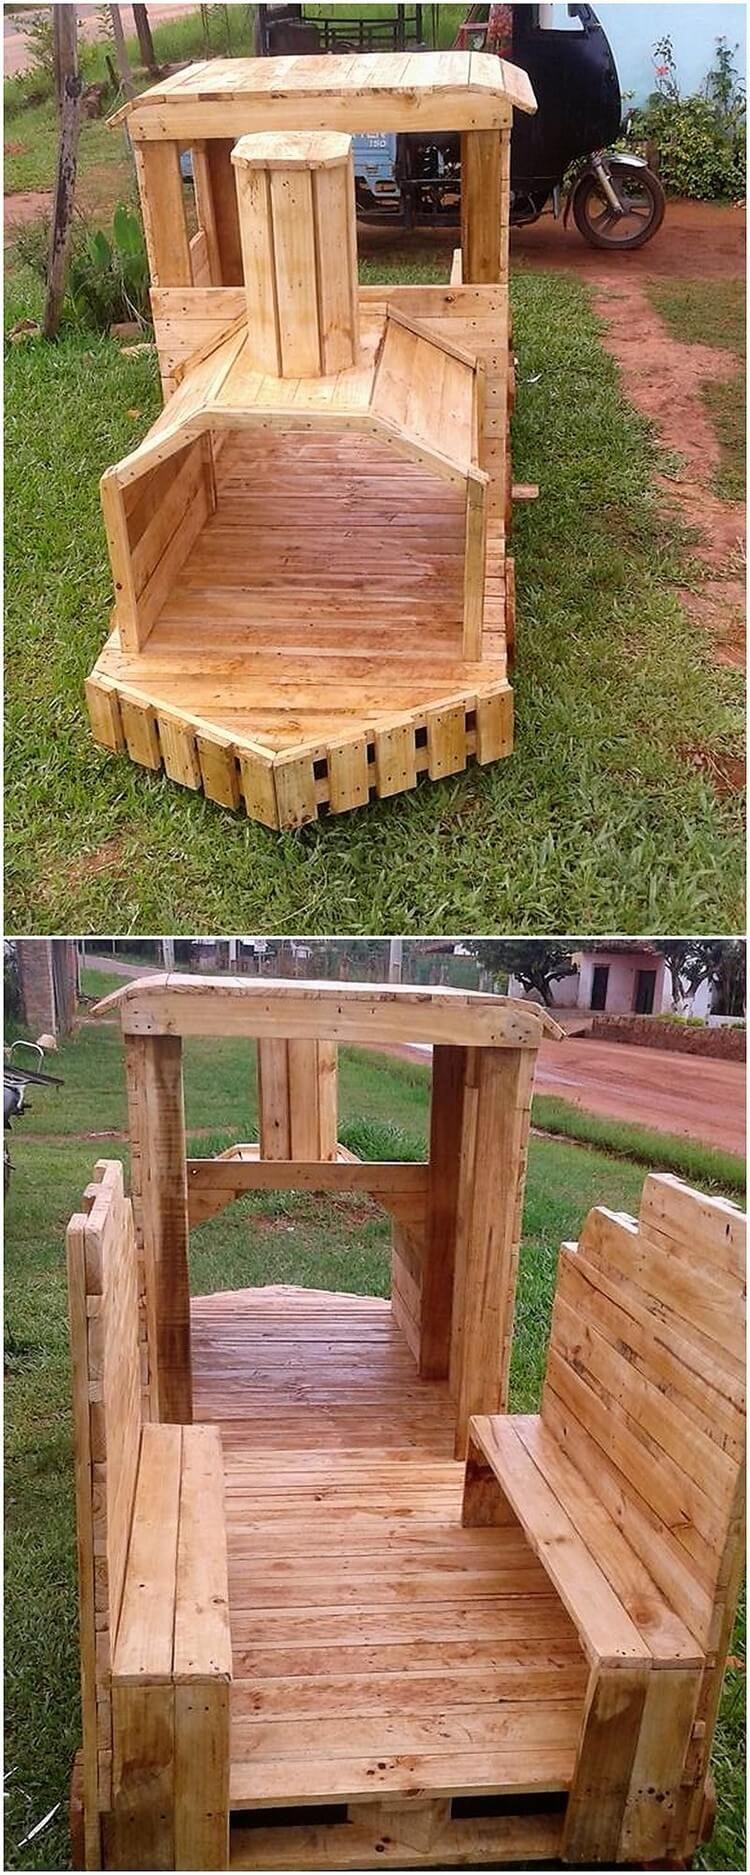 Splendid DIY Recycled Wood Pallet Creations   Spielplätze, Baumhaus ...